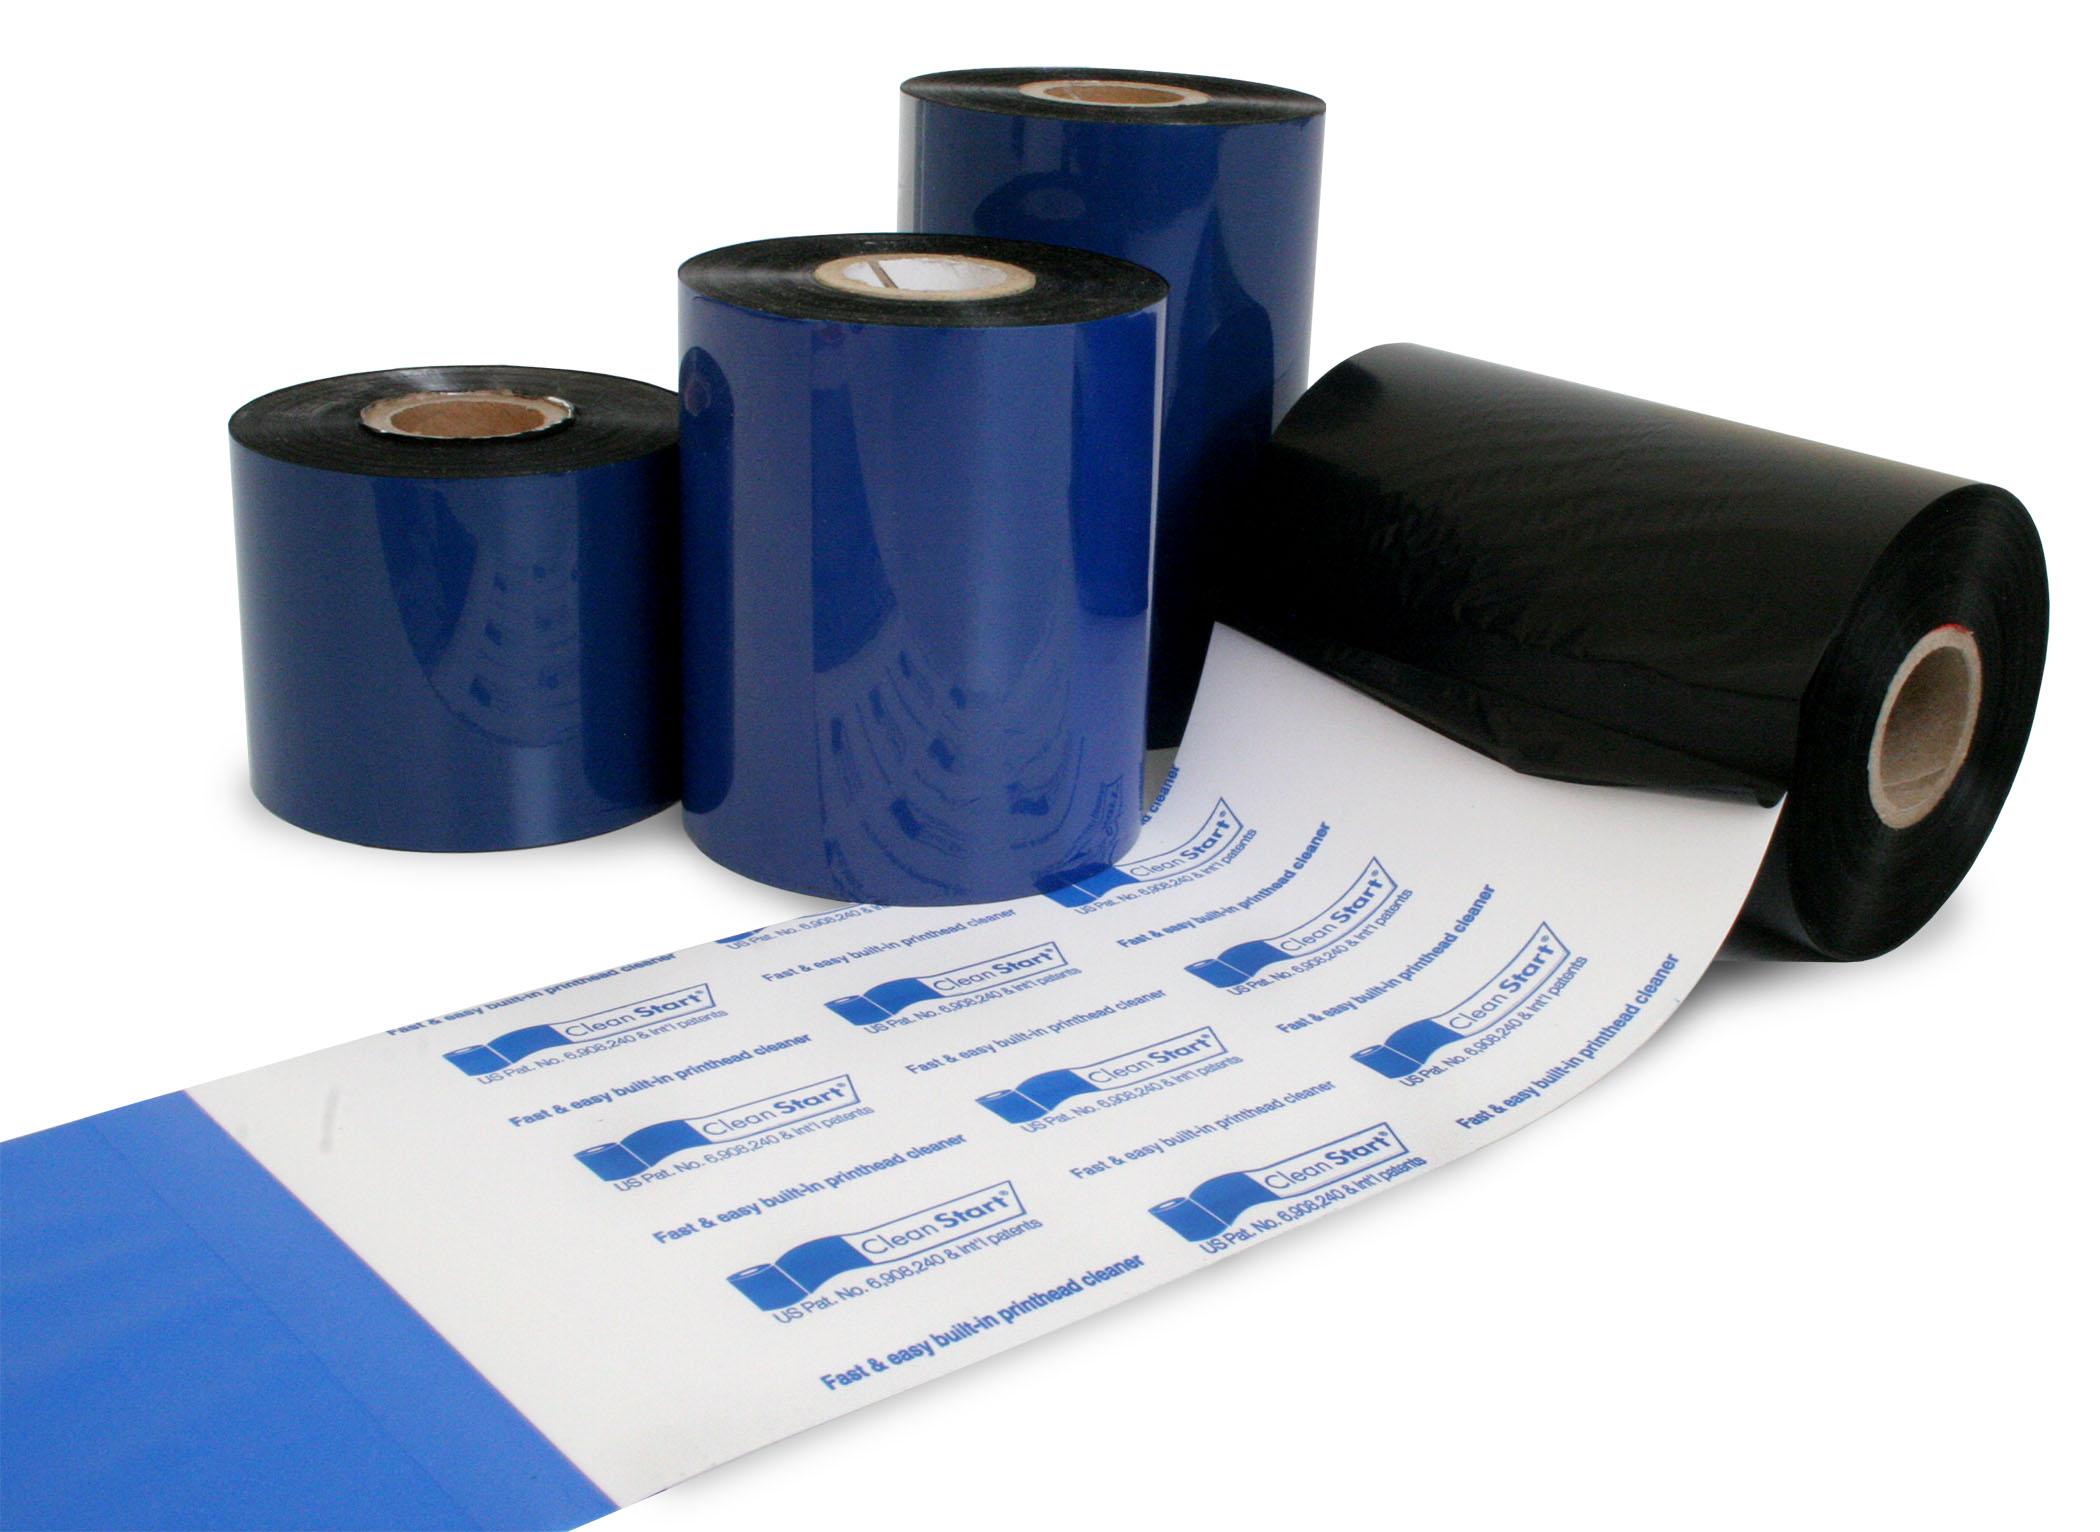 Go-Mark 100 Economy Wax Thermal Transfer Printer Ribbons for